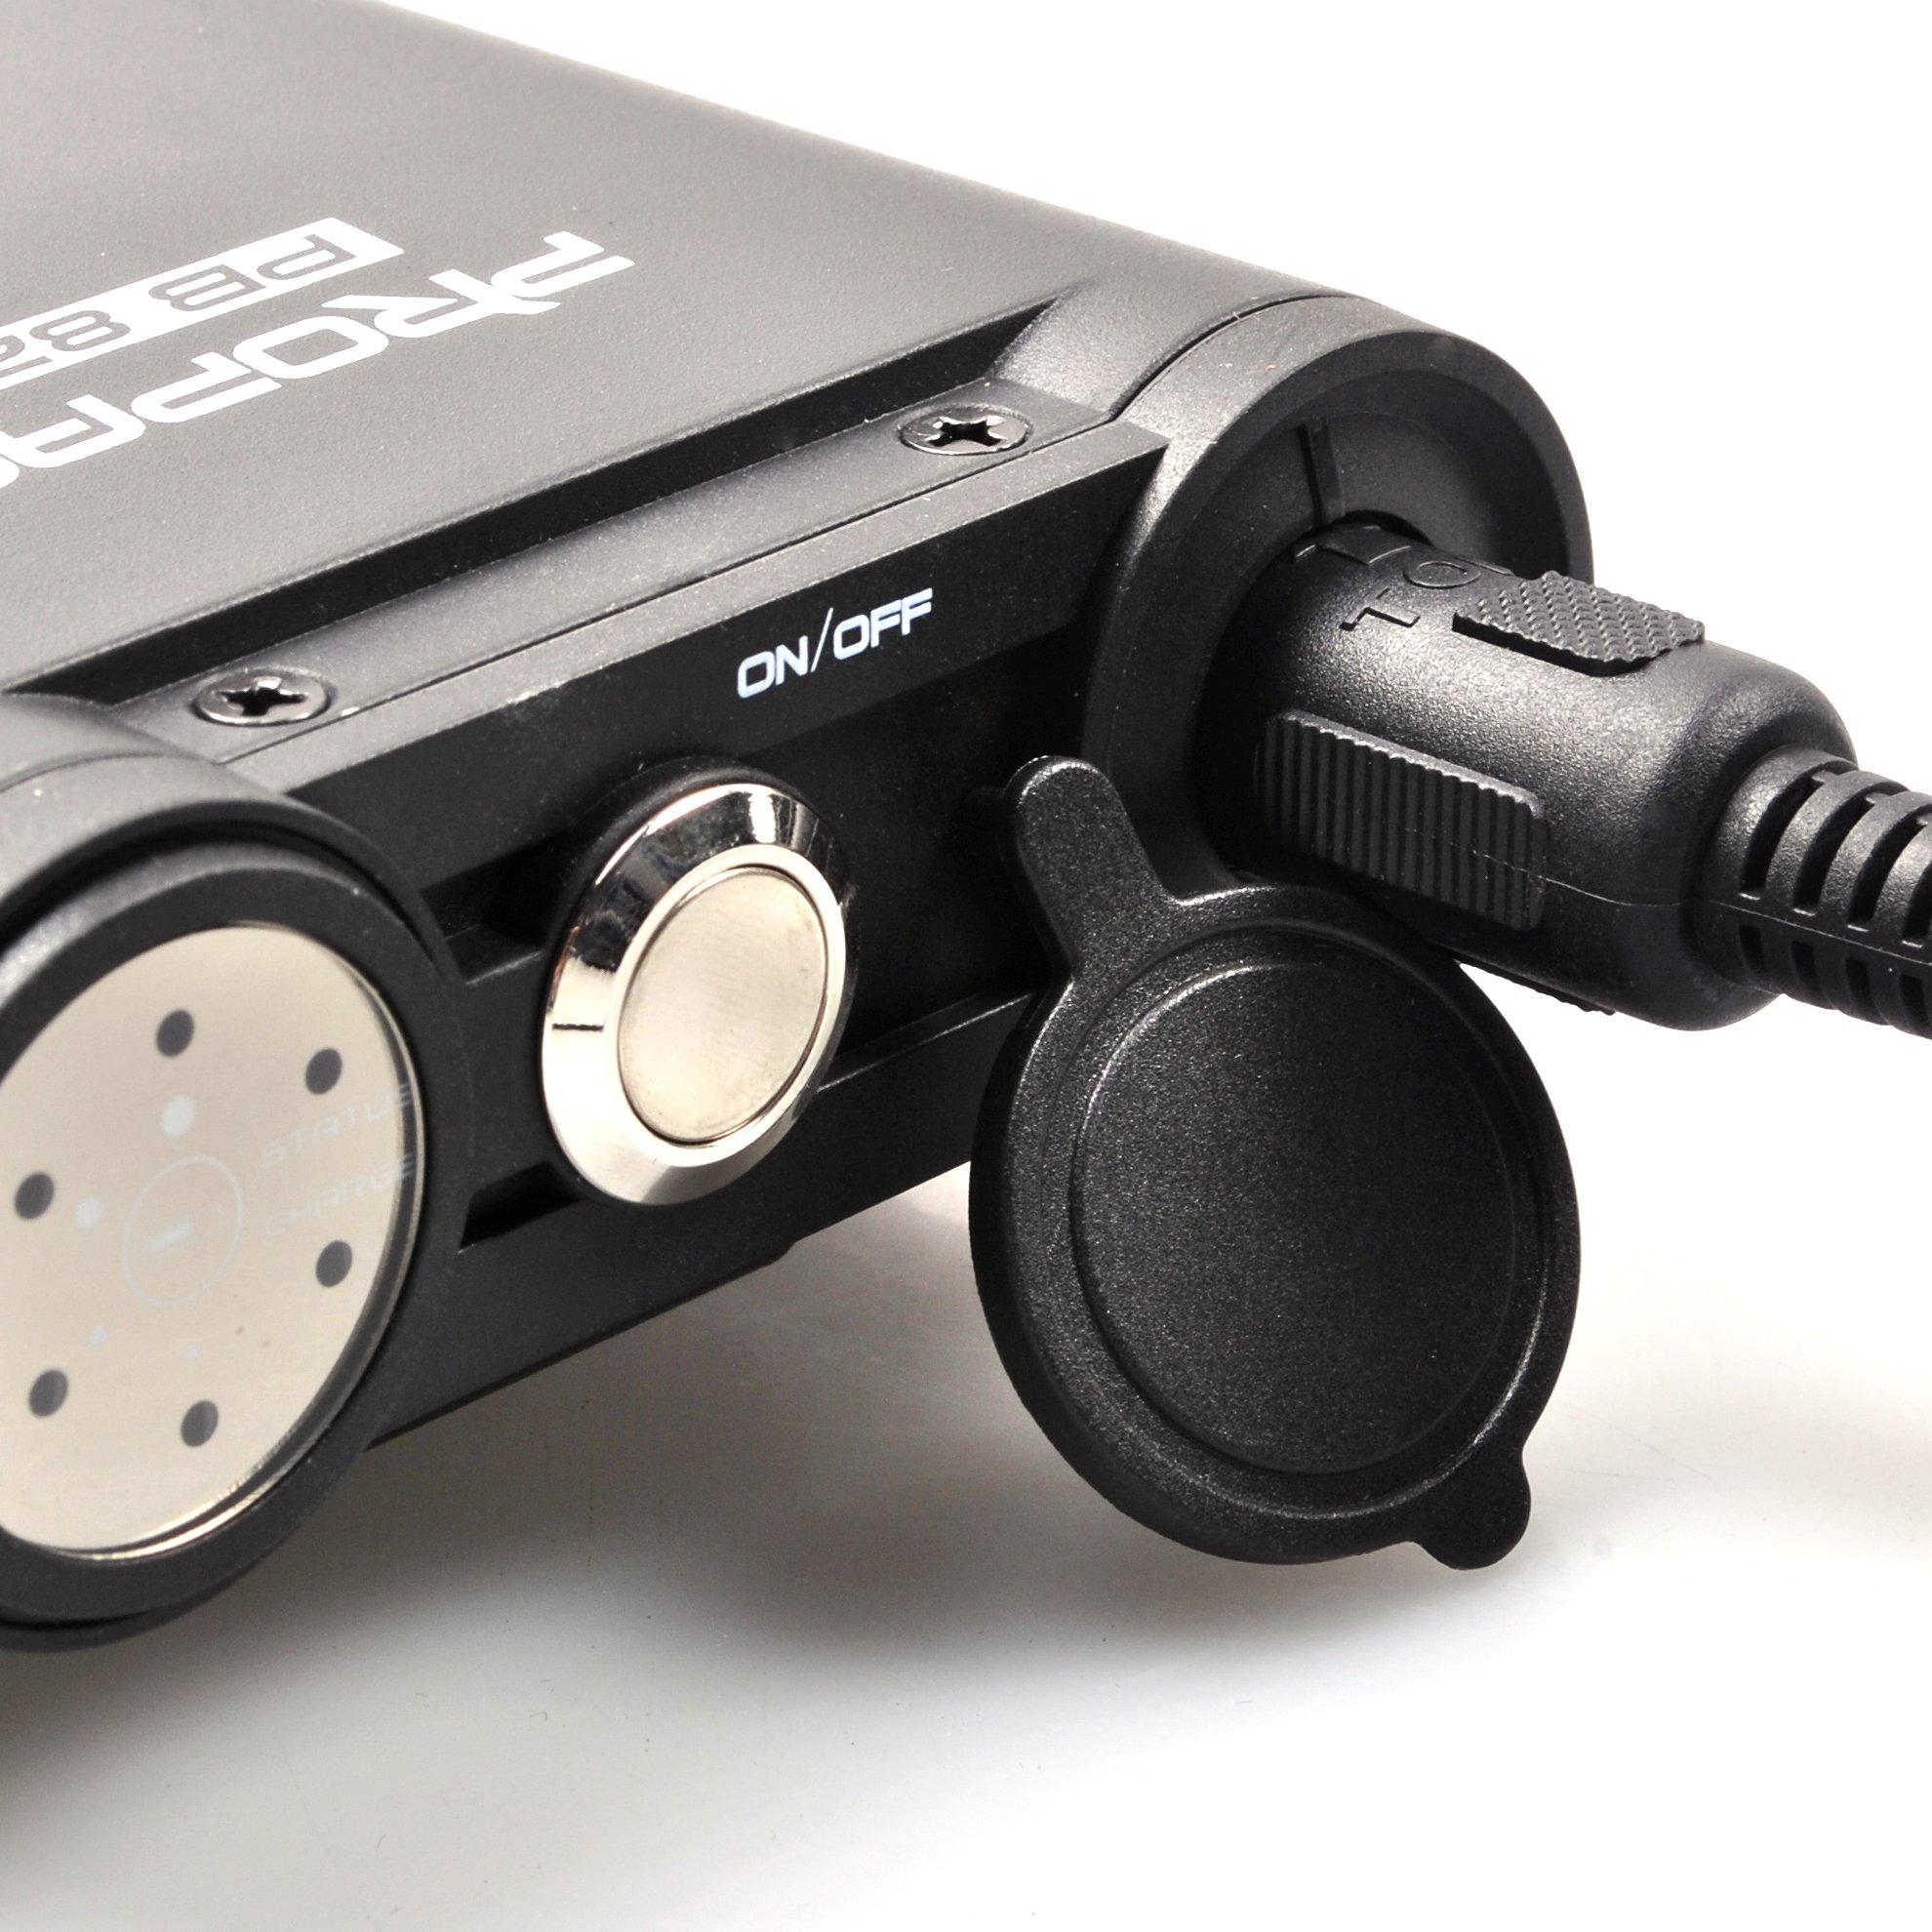 Godox Portable Extended Flash Power Battery Pack for Canon 580EX2 Nikon SB900 Sony HVL-F58AM Olympus FL-50R